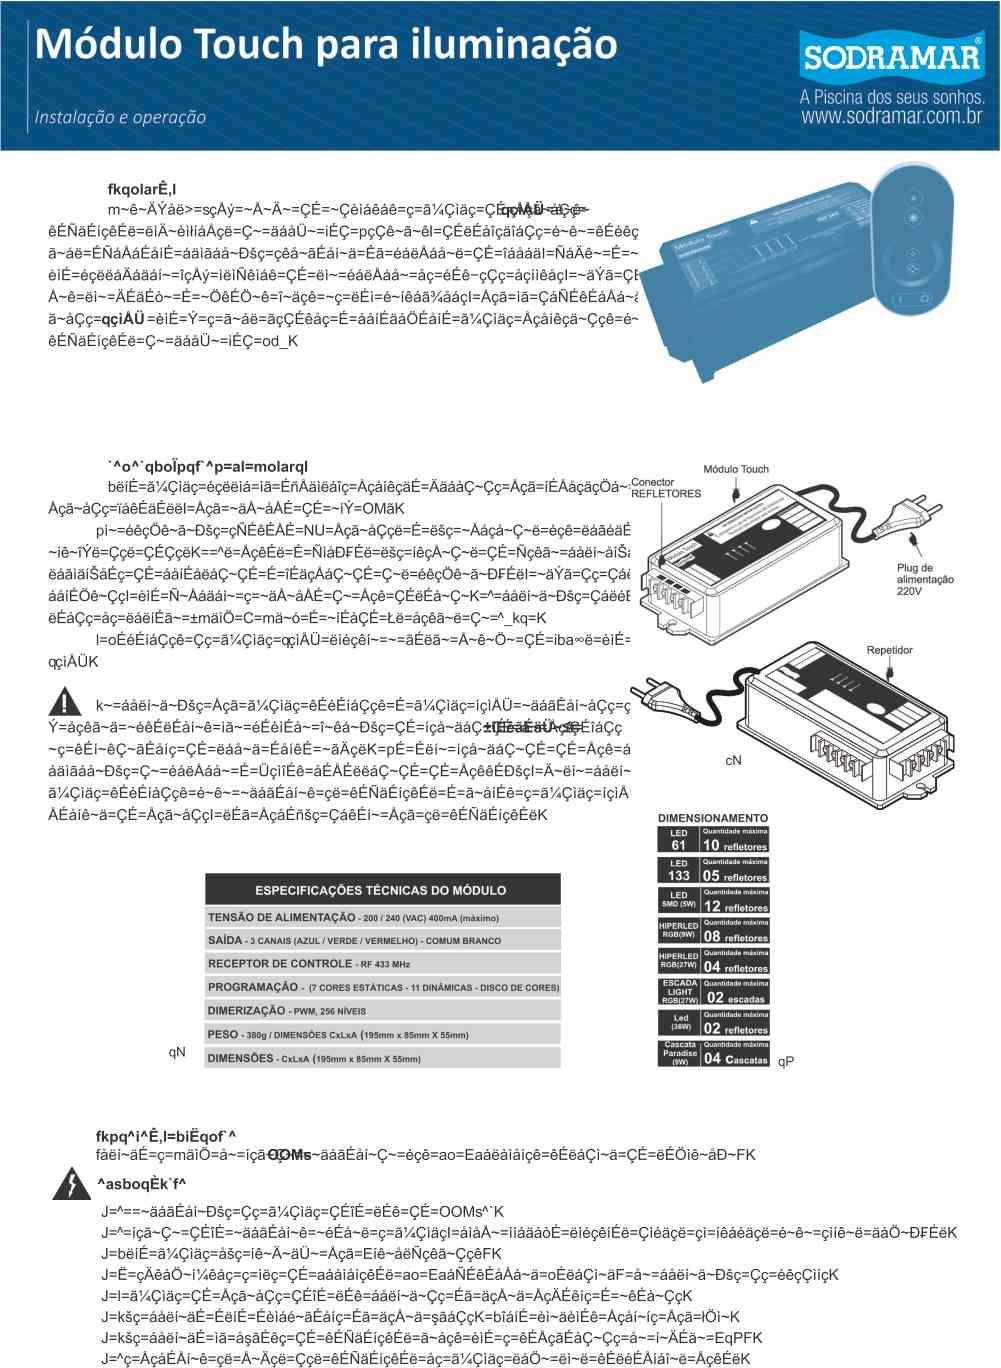 Controlador Touch Led Piscina Controle Remoto Sodramar